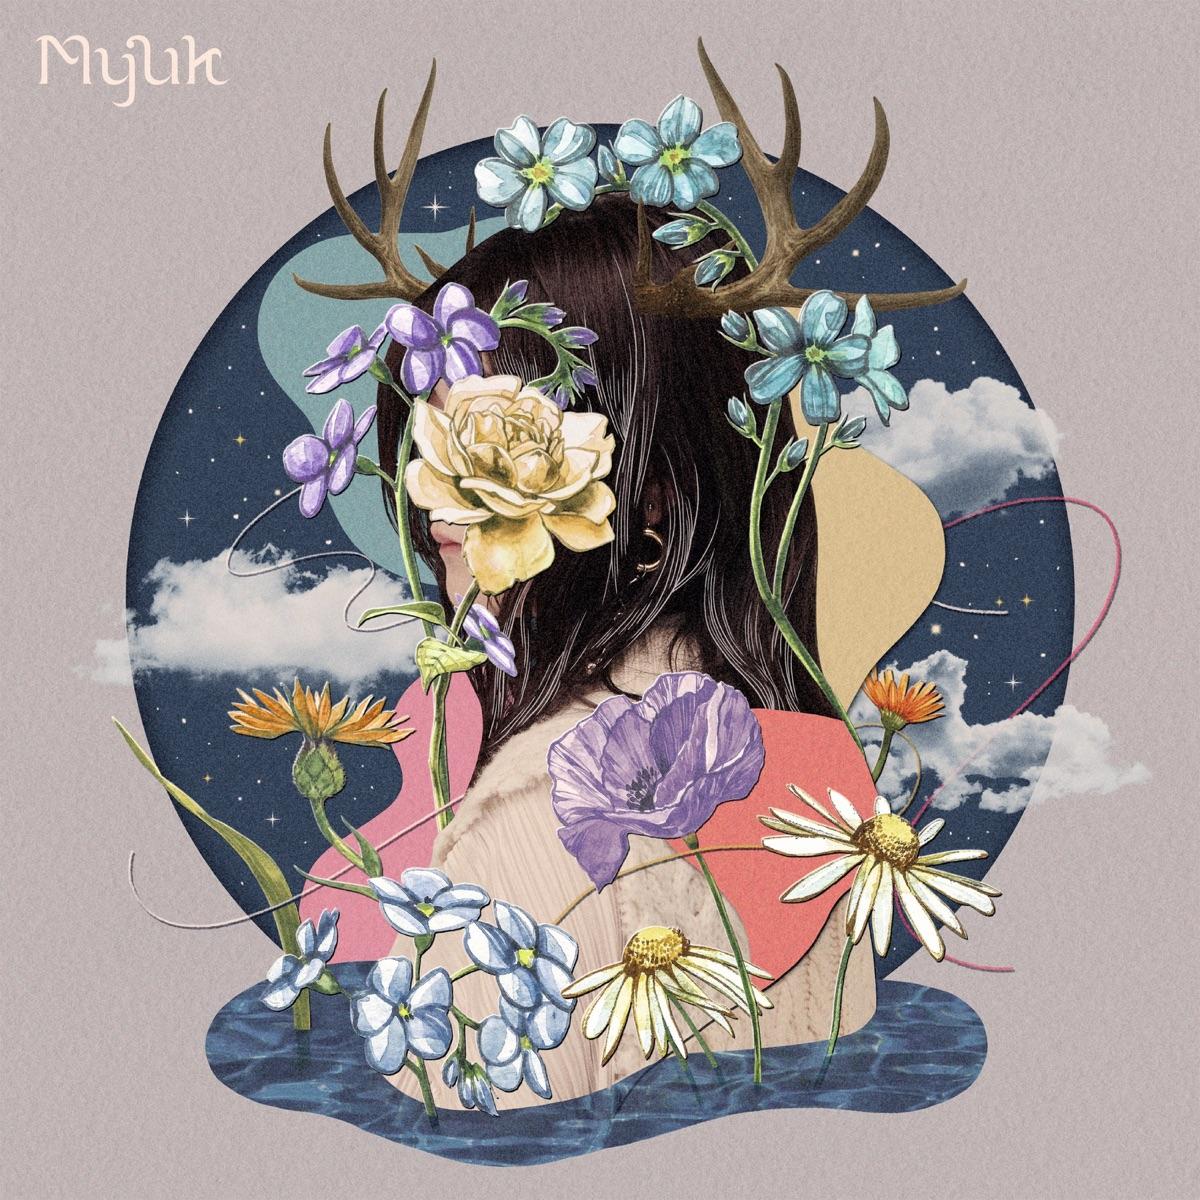 『Myuk - 魔法 歌詞』収録の『魔法』ジャケット